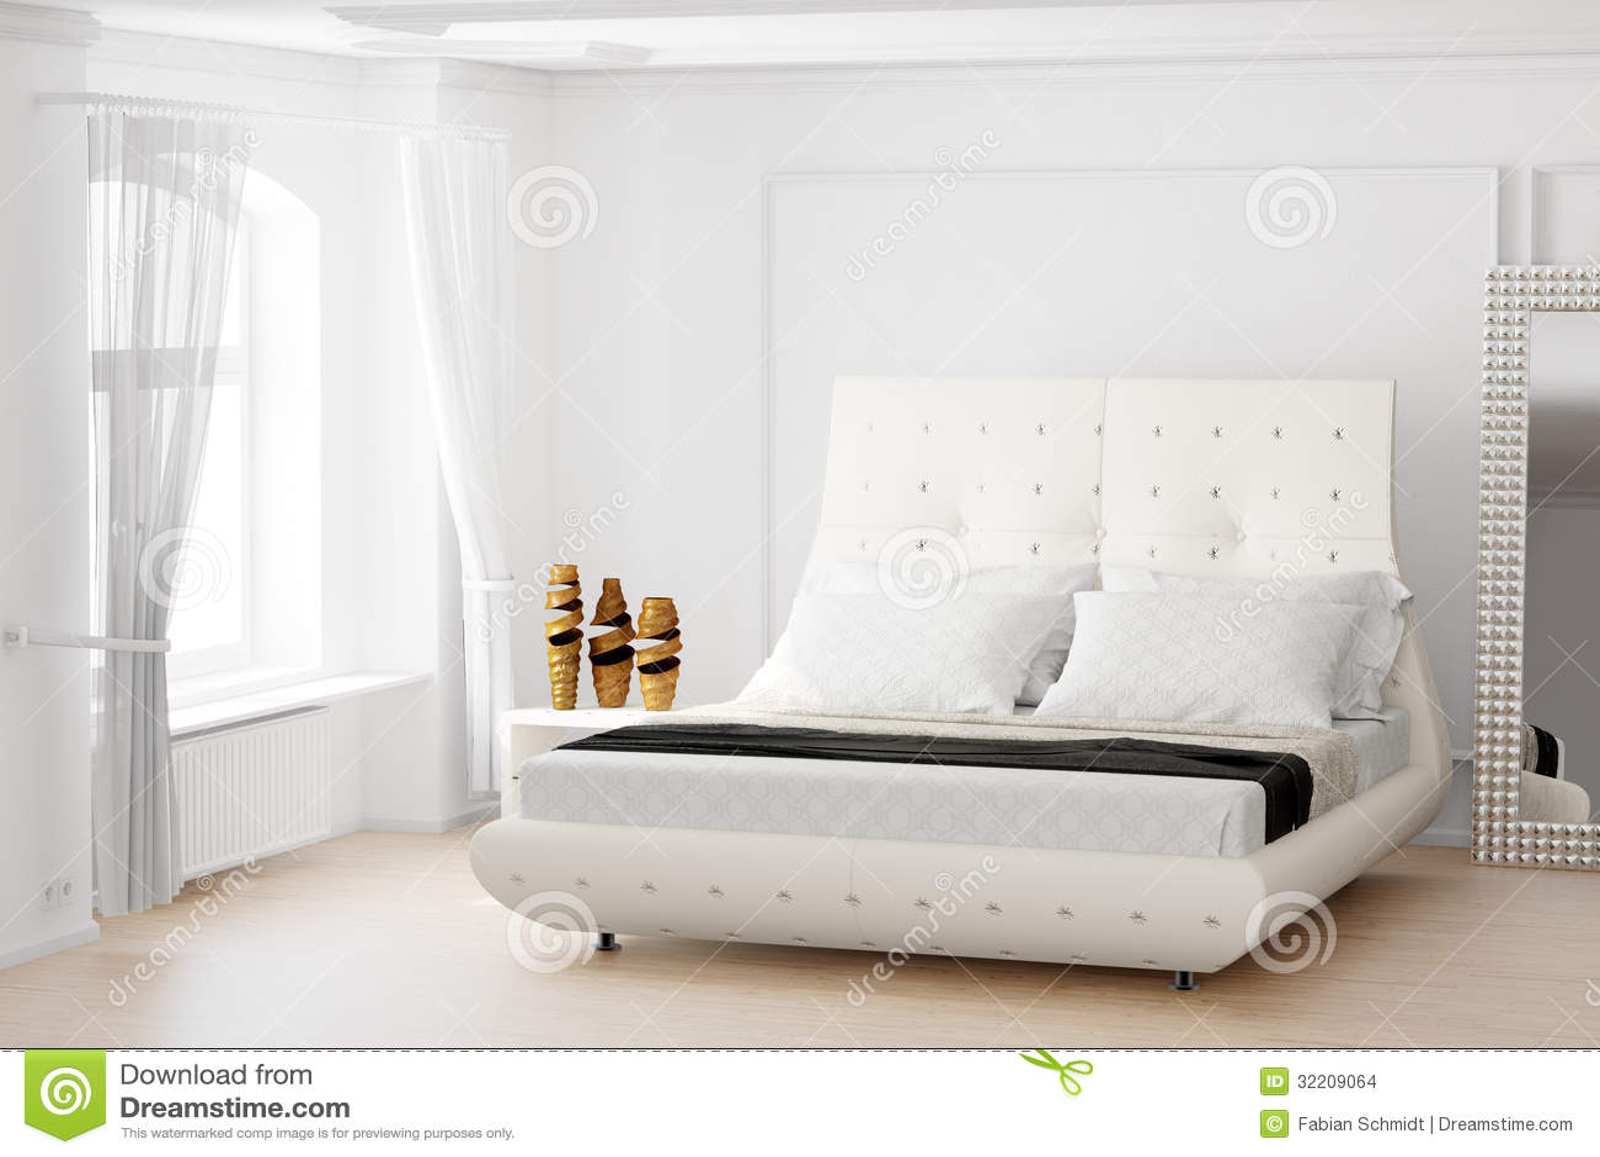 https://thumbs.dreamstime.com/z/slaapkamer-met-spiegel-32209064.jpg